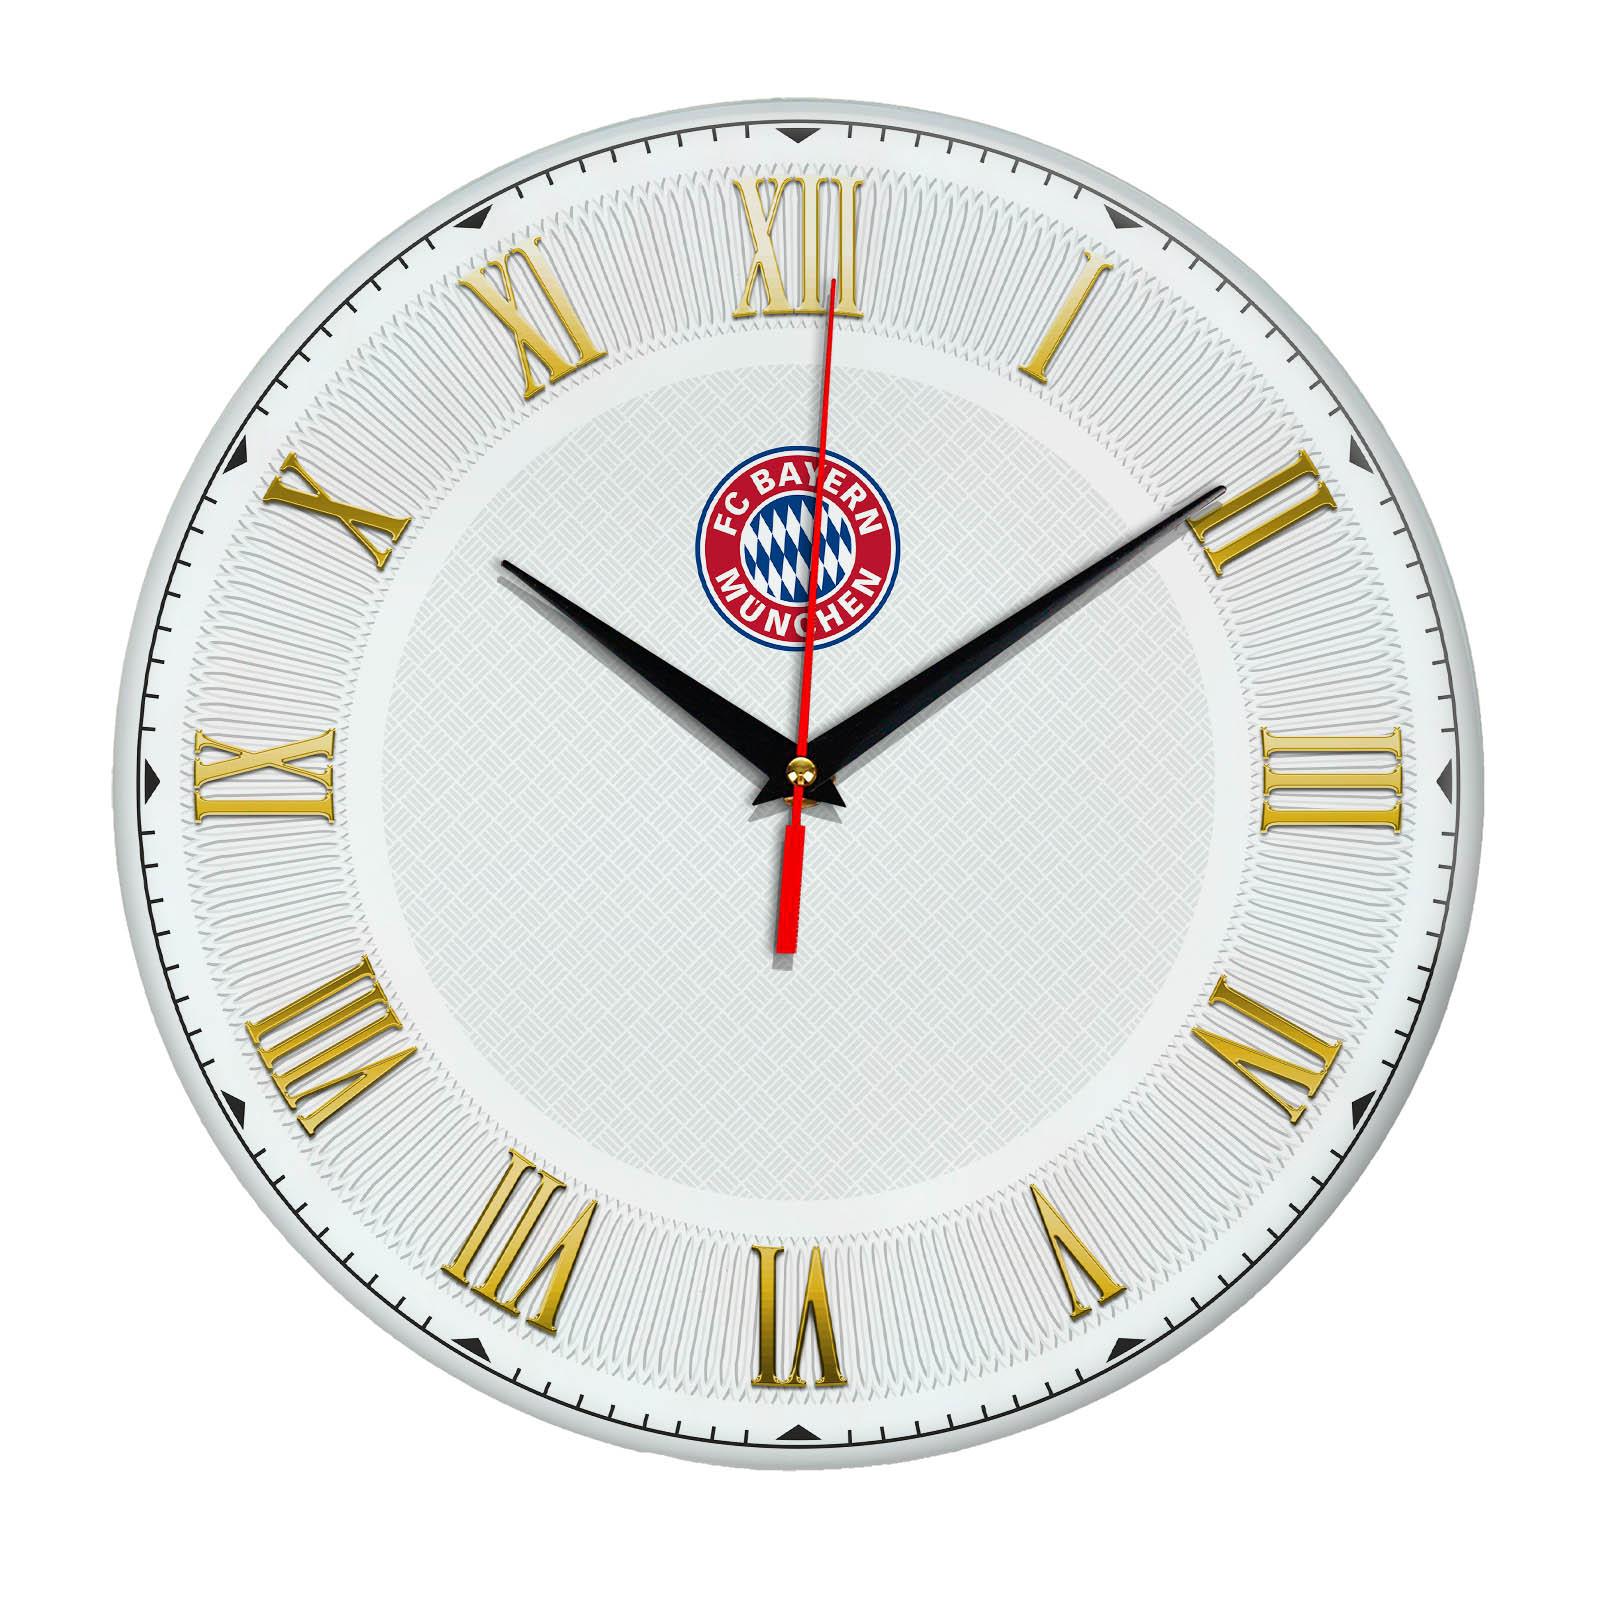 Настенные часы «Футбольный клуб BAYERN MUNCHEN»